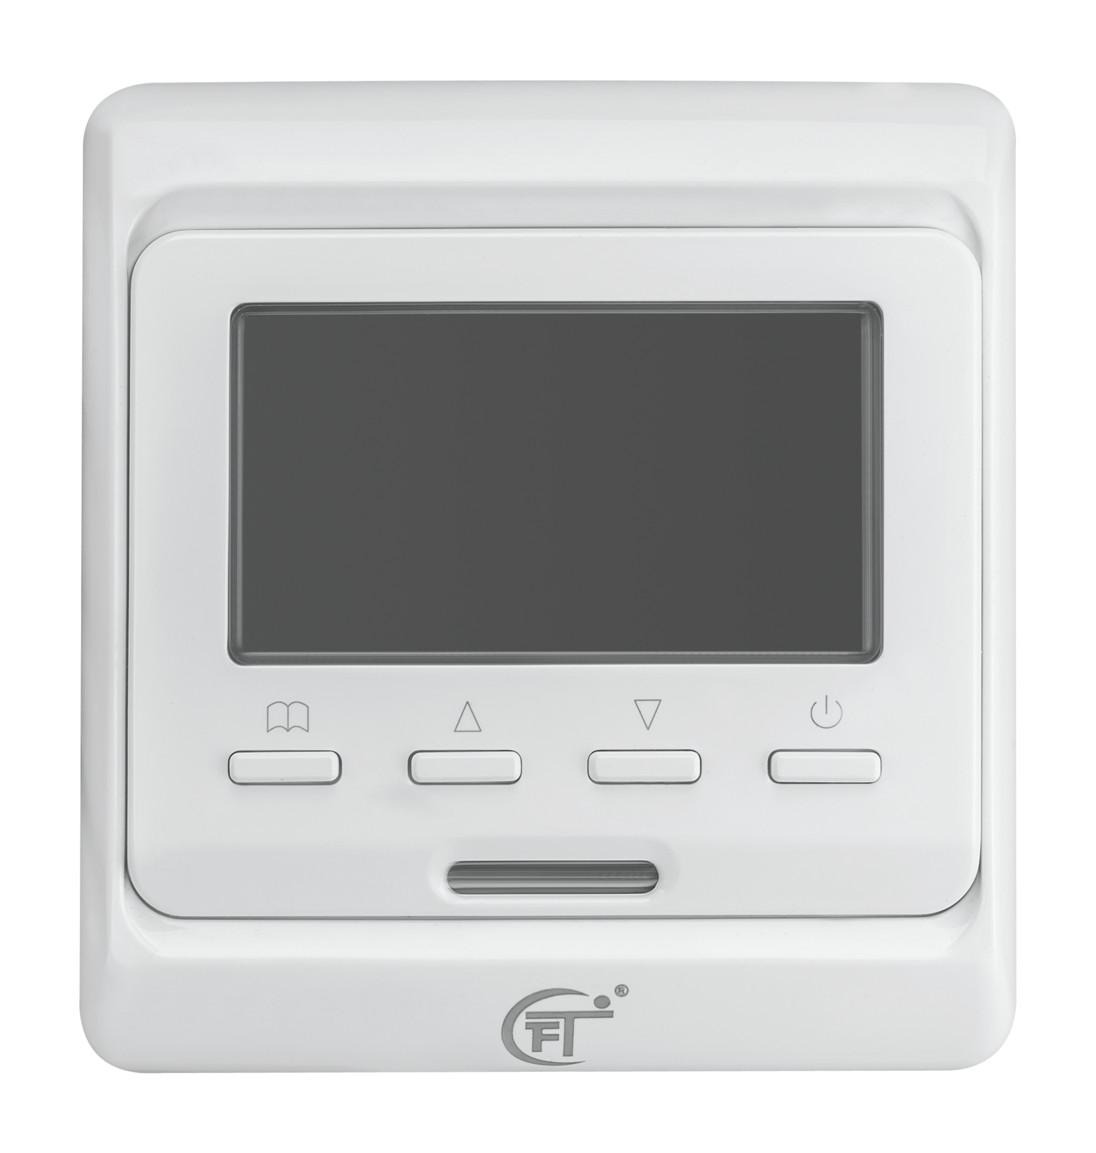 FT2005